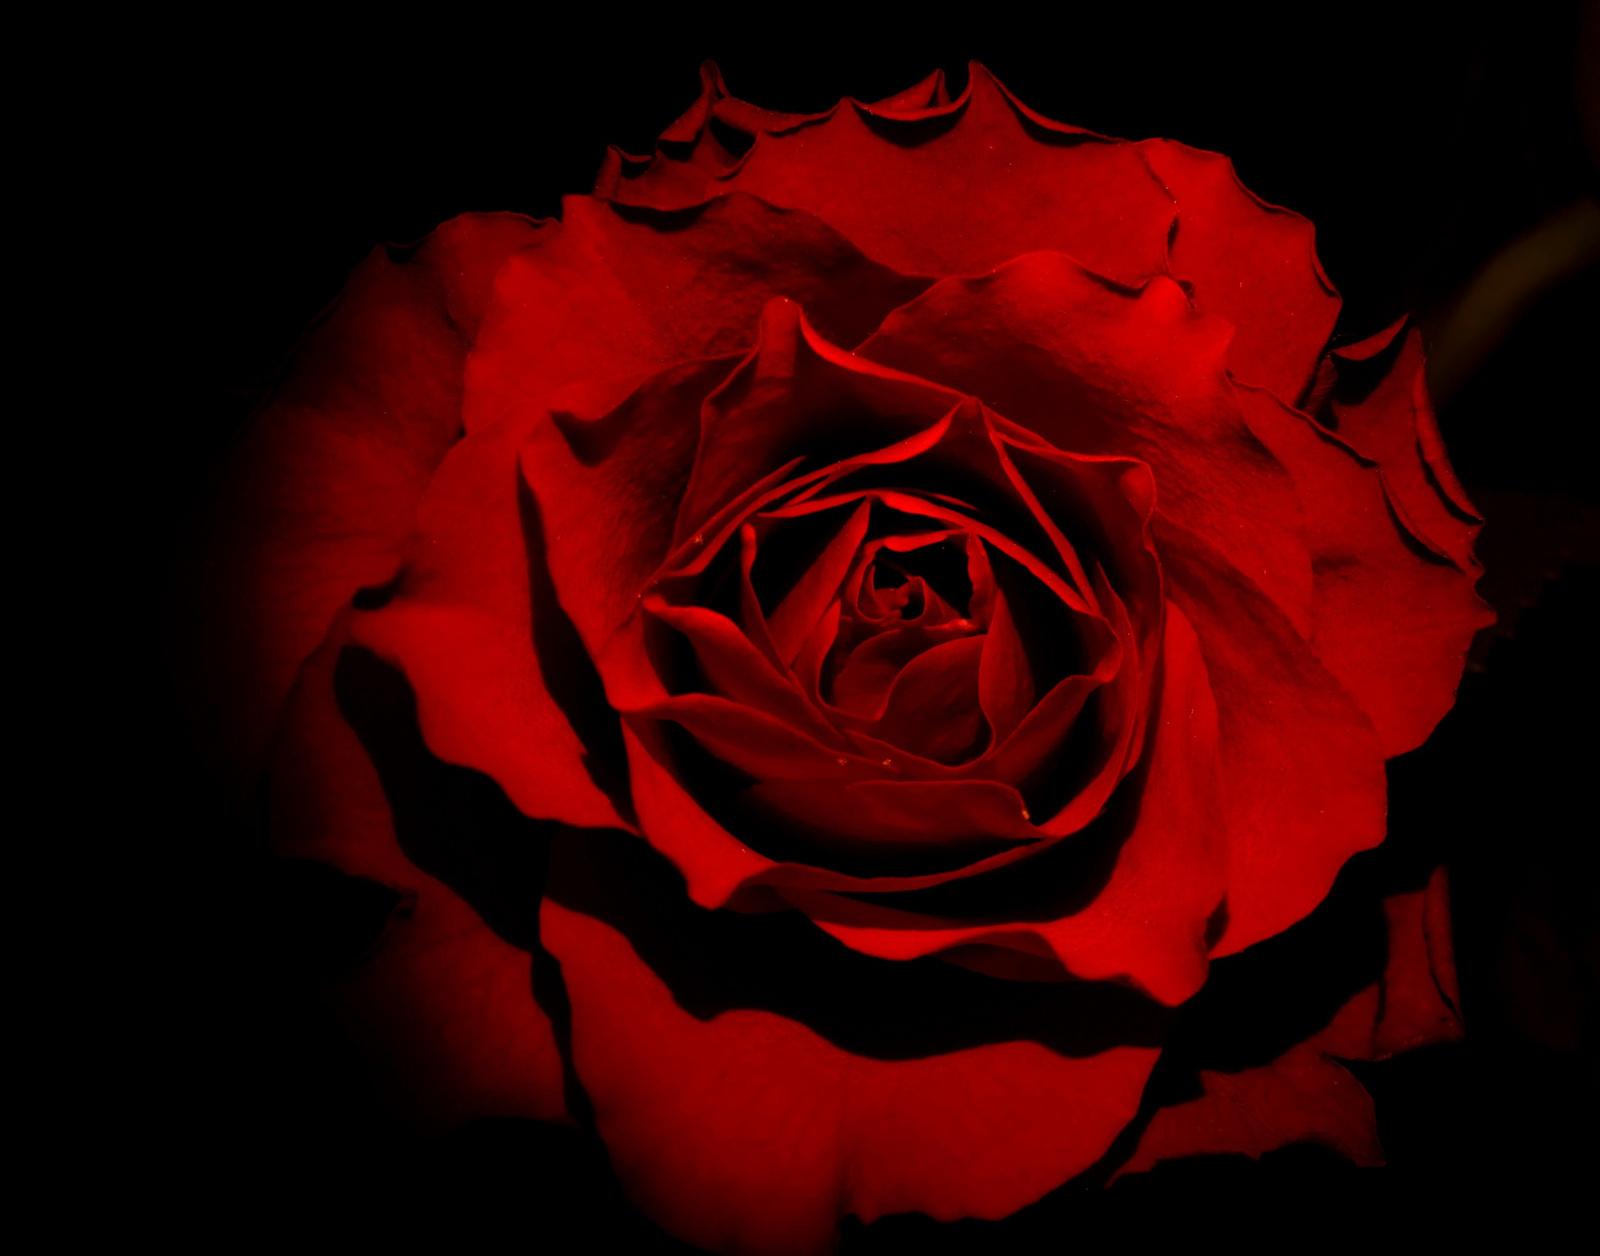 rózsi